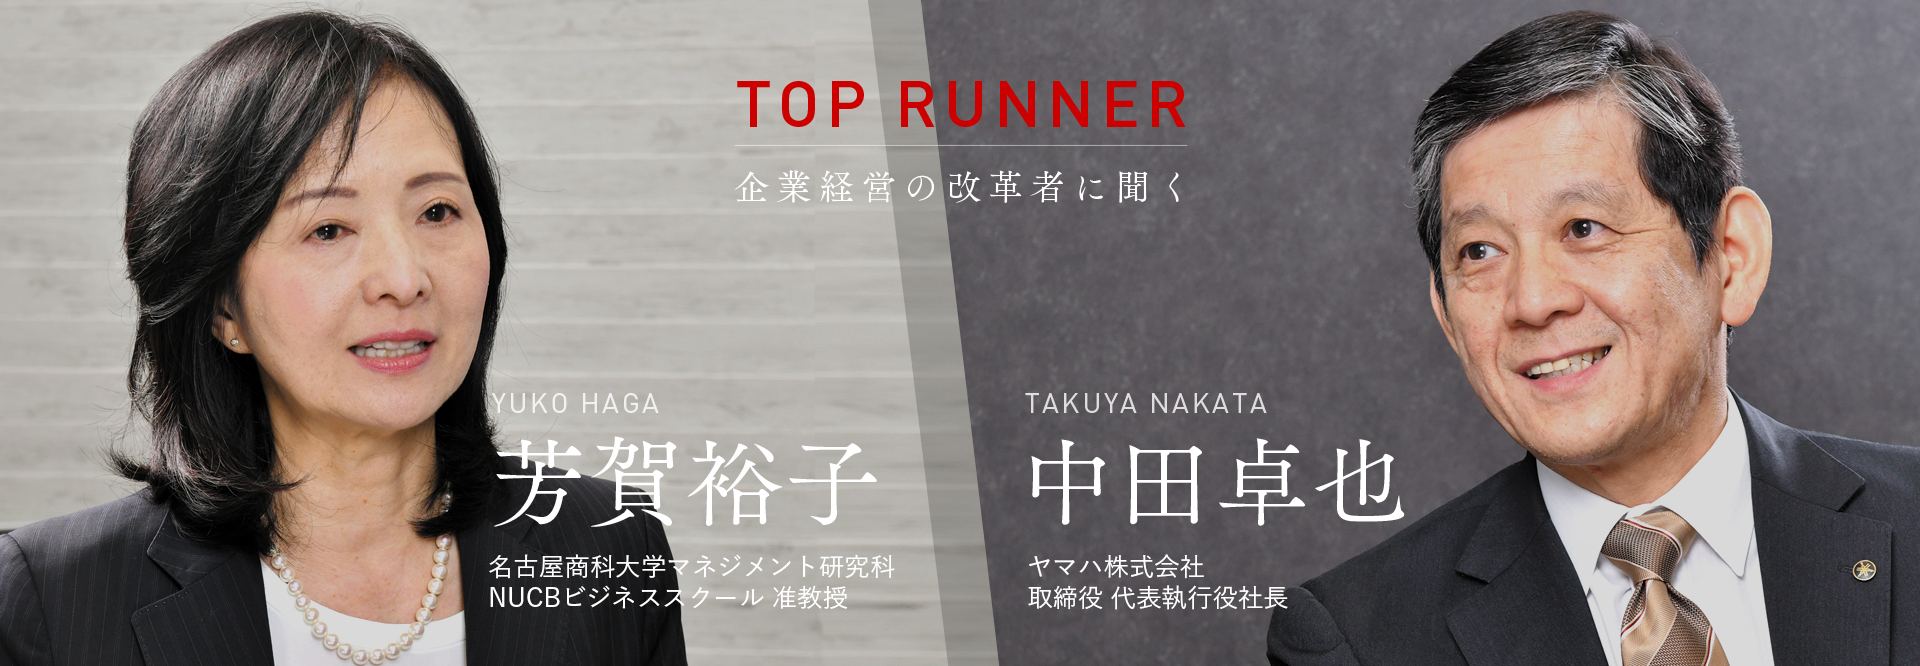 TOP RUNNER:企業経営の改革者に聞く vol.2 中田卓也×芳賀裕子